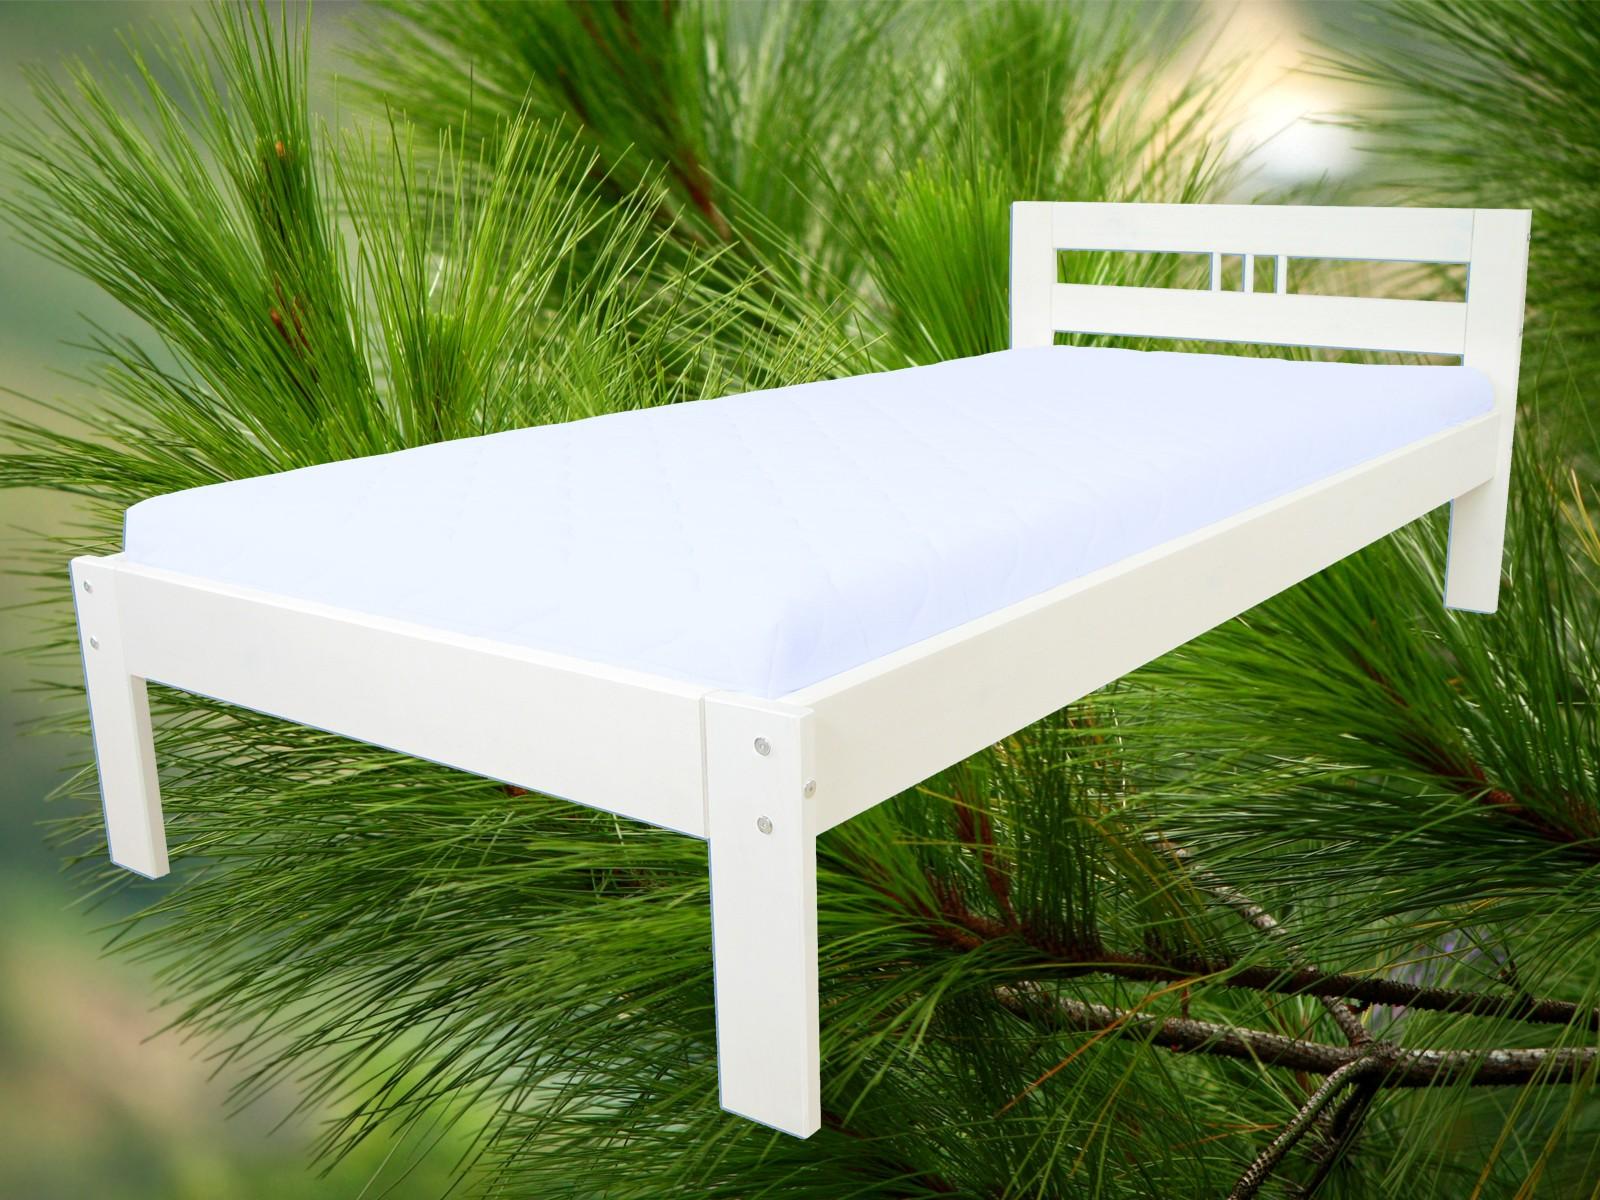 futonbett 100x200 kinderbett jugendbett g stebett matratzen rollrost wm. Black Bedroom Furniture Sets. Home Design Ideas